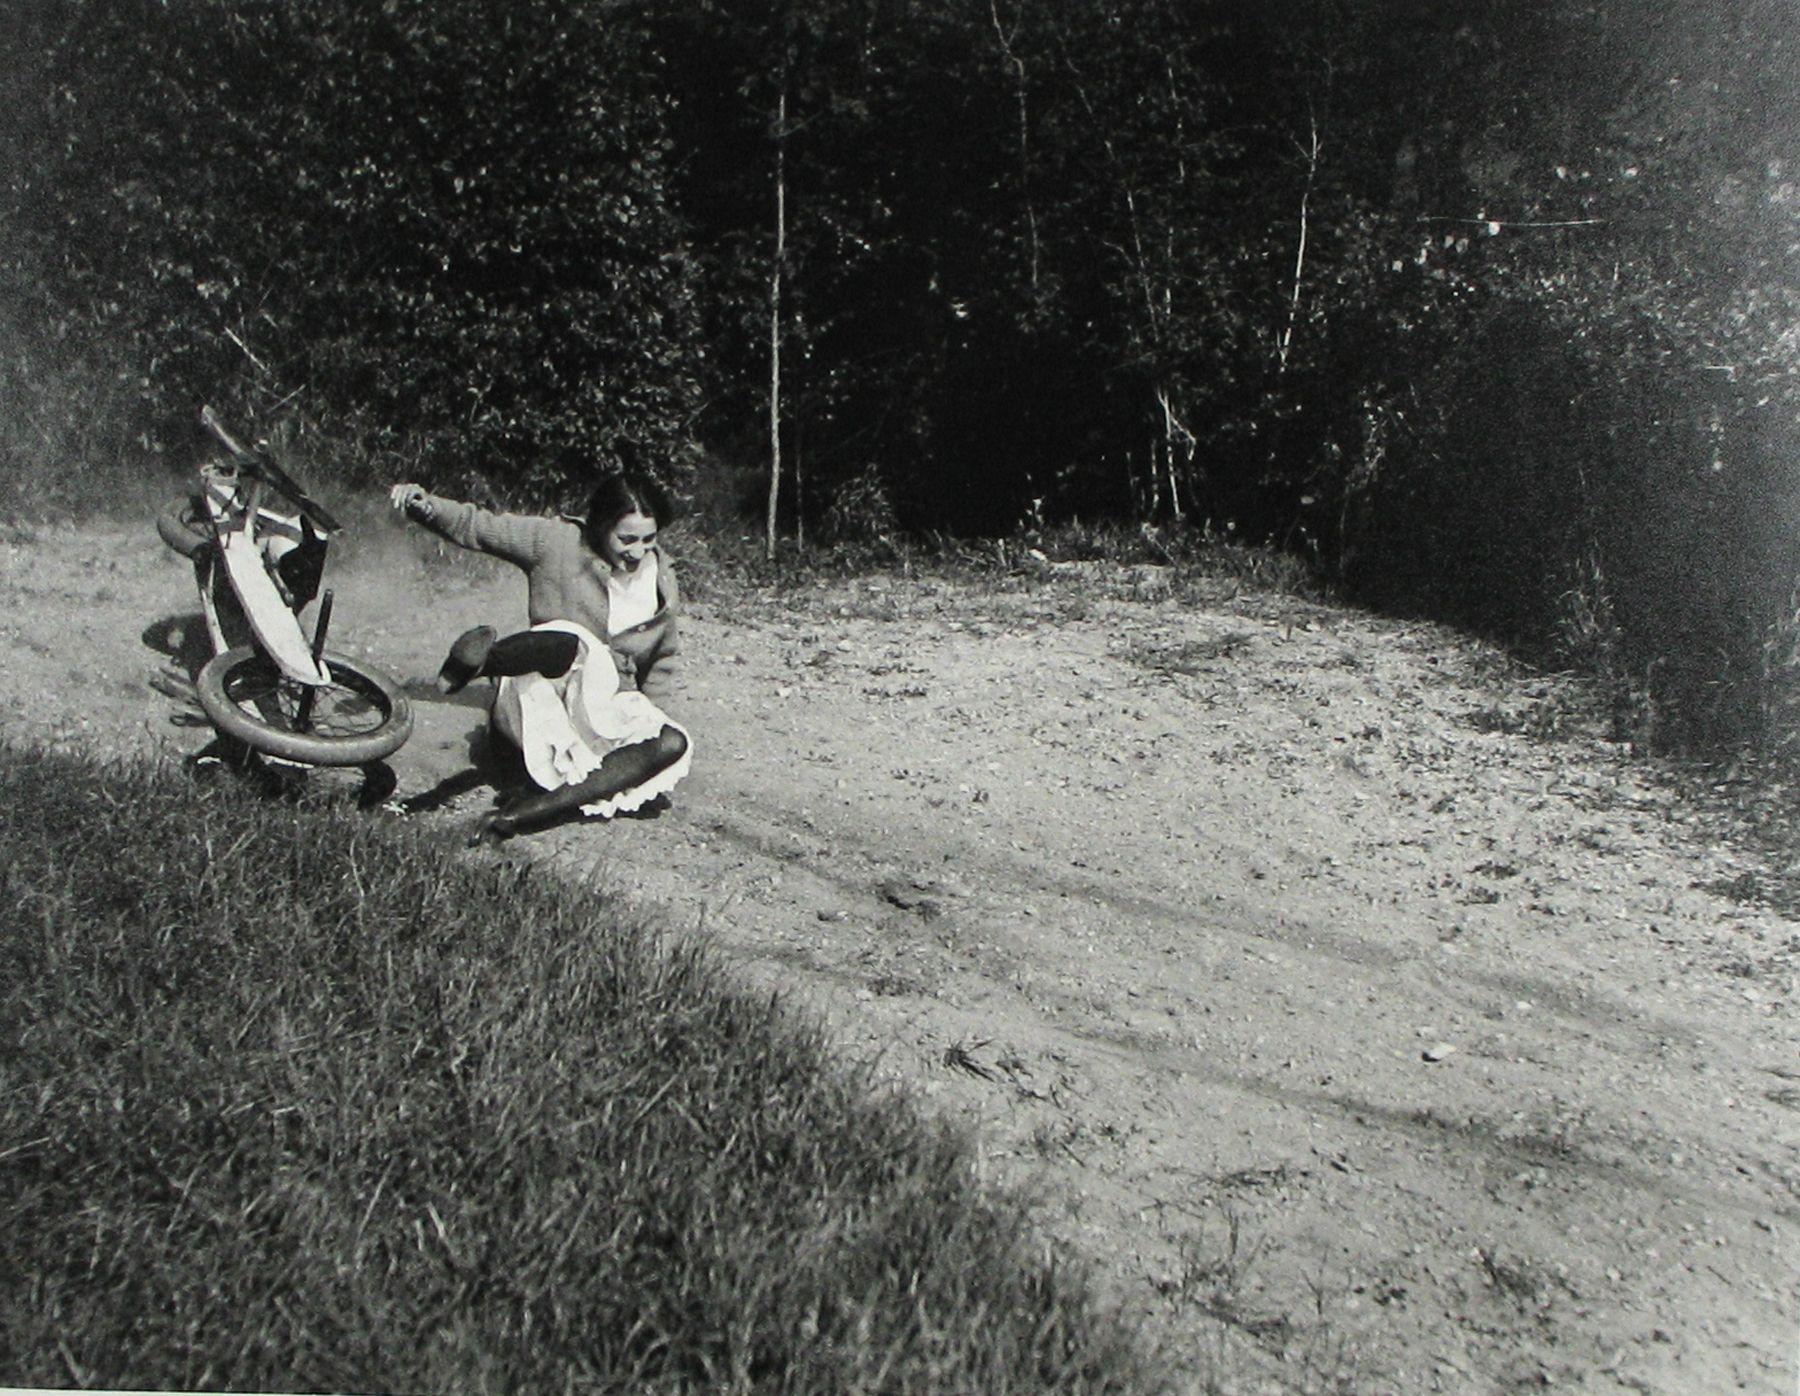 Jacques-Henri Lartigue - Simone, Rouzat, 1913 - Howard Greenberg Gallery